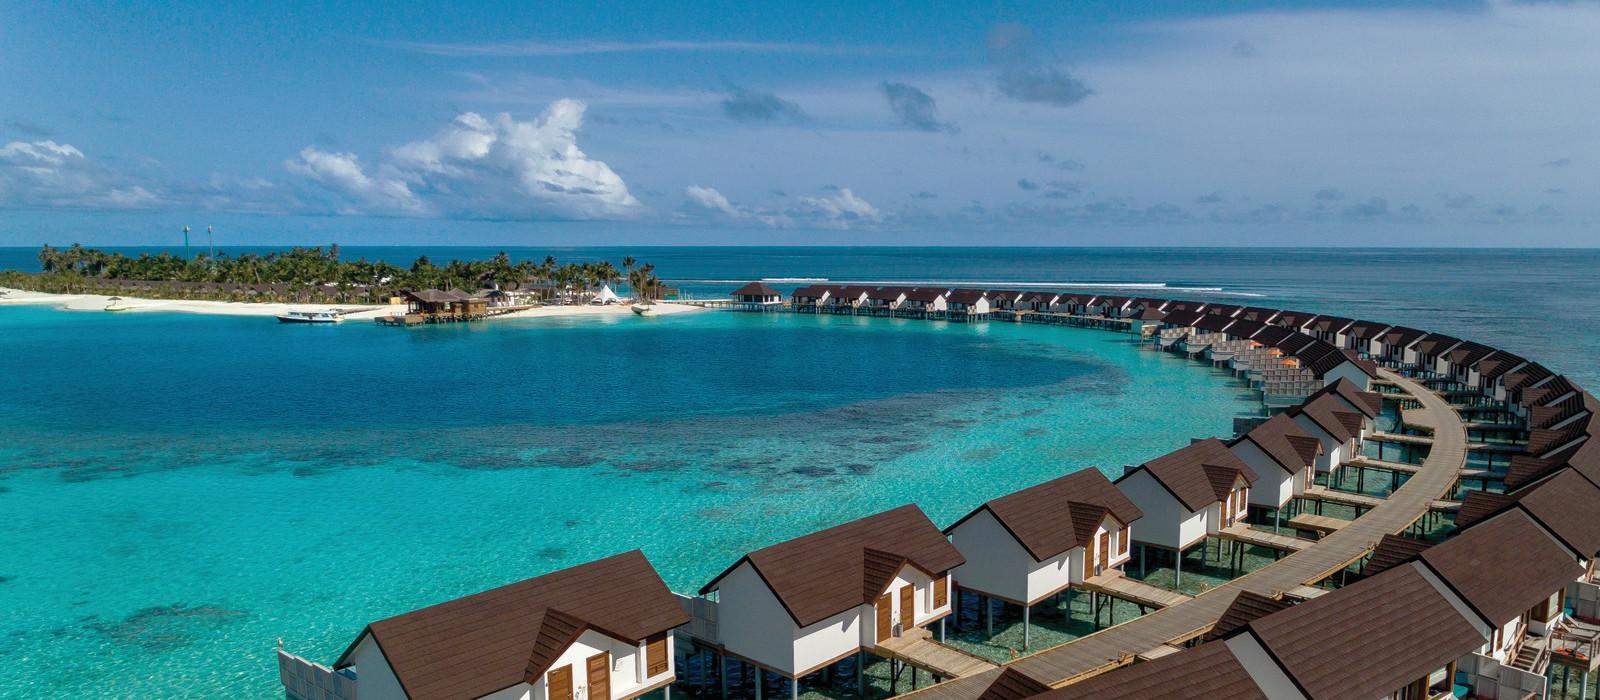 Hotel OBLU SELECT at Sangeli Malediven